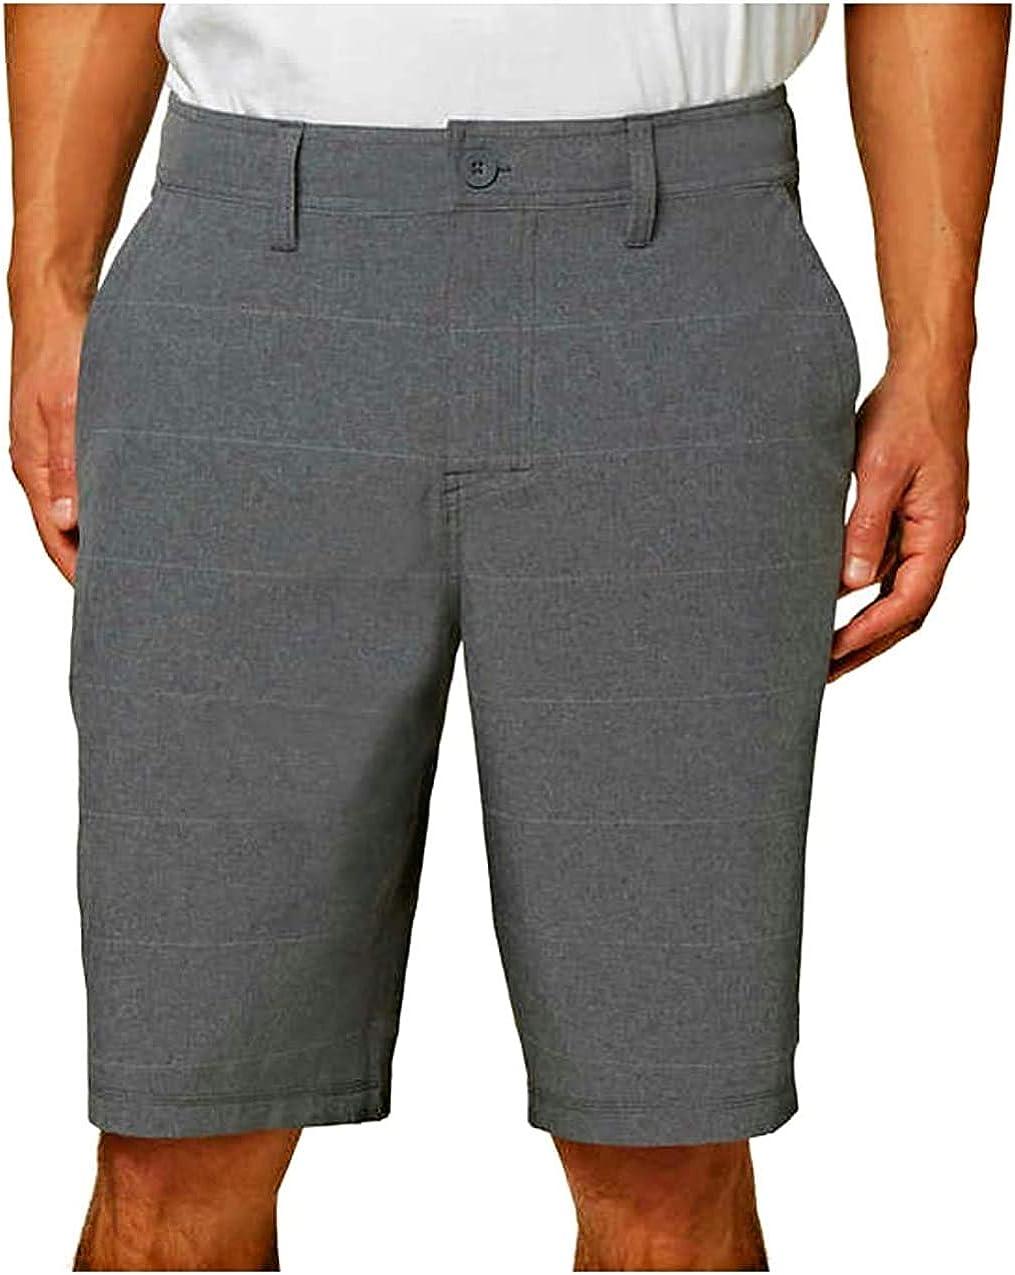 Hang Ten Fixed price for sale Men's Short Hybrid Free shipping